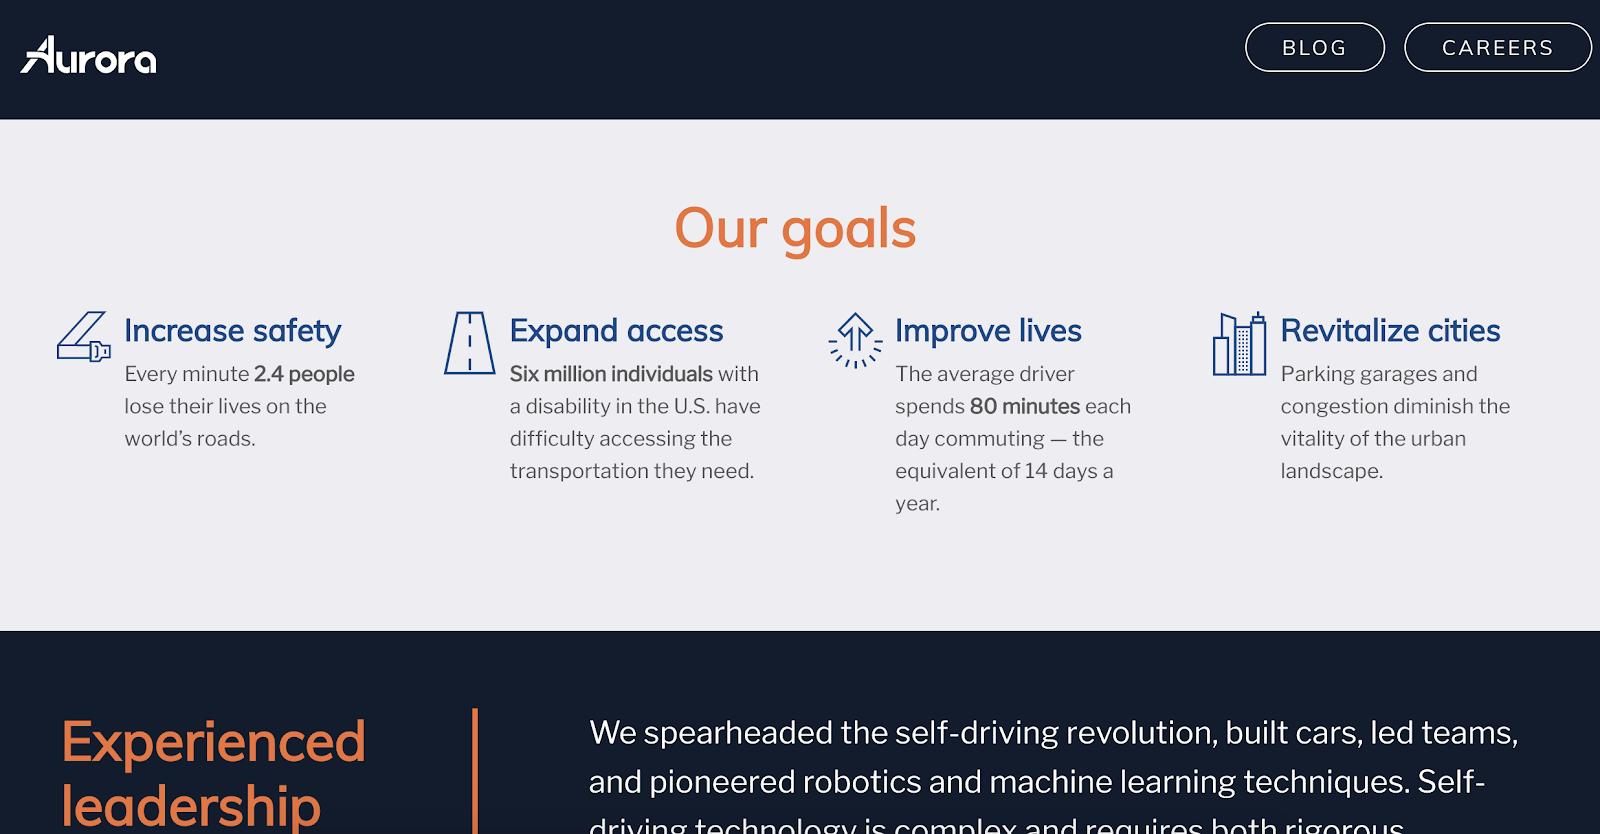 Three automotive startups branding on  TECH have raised over